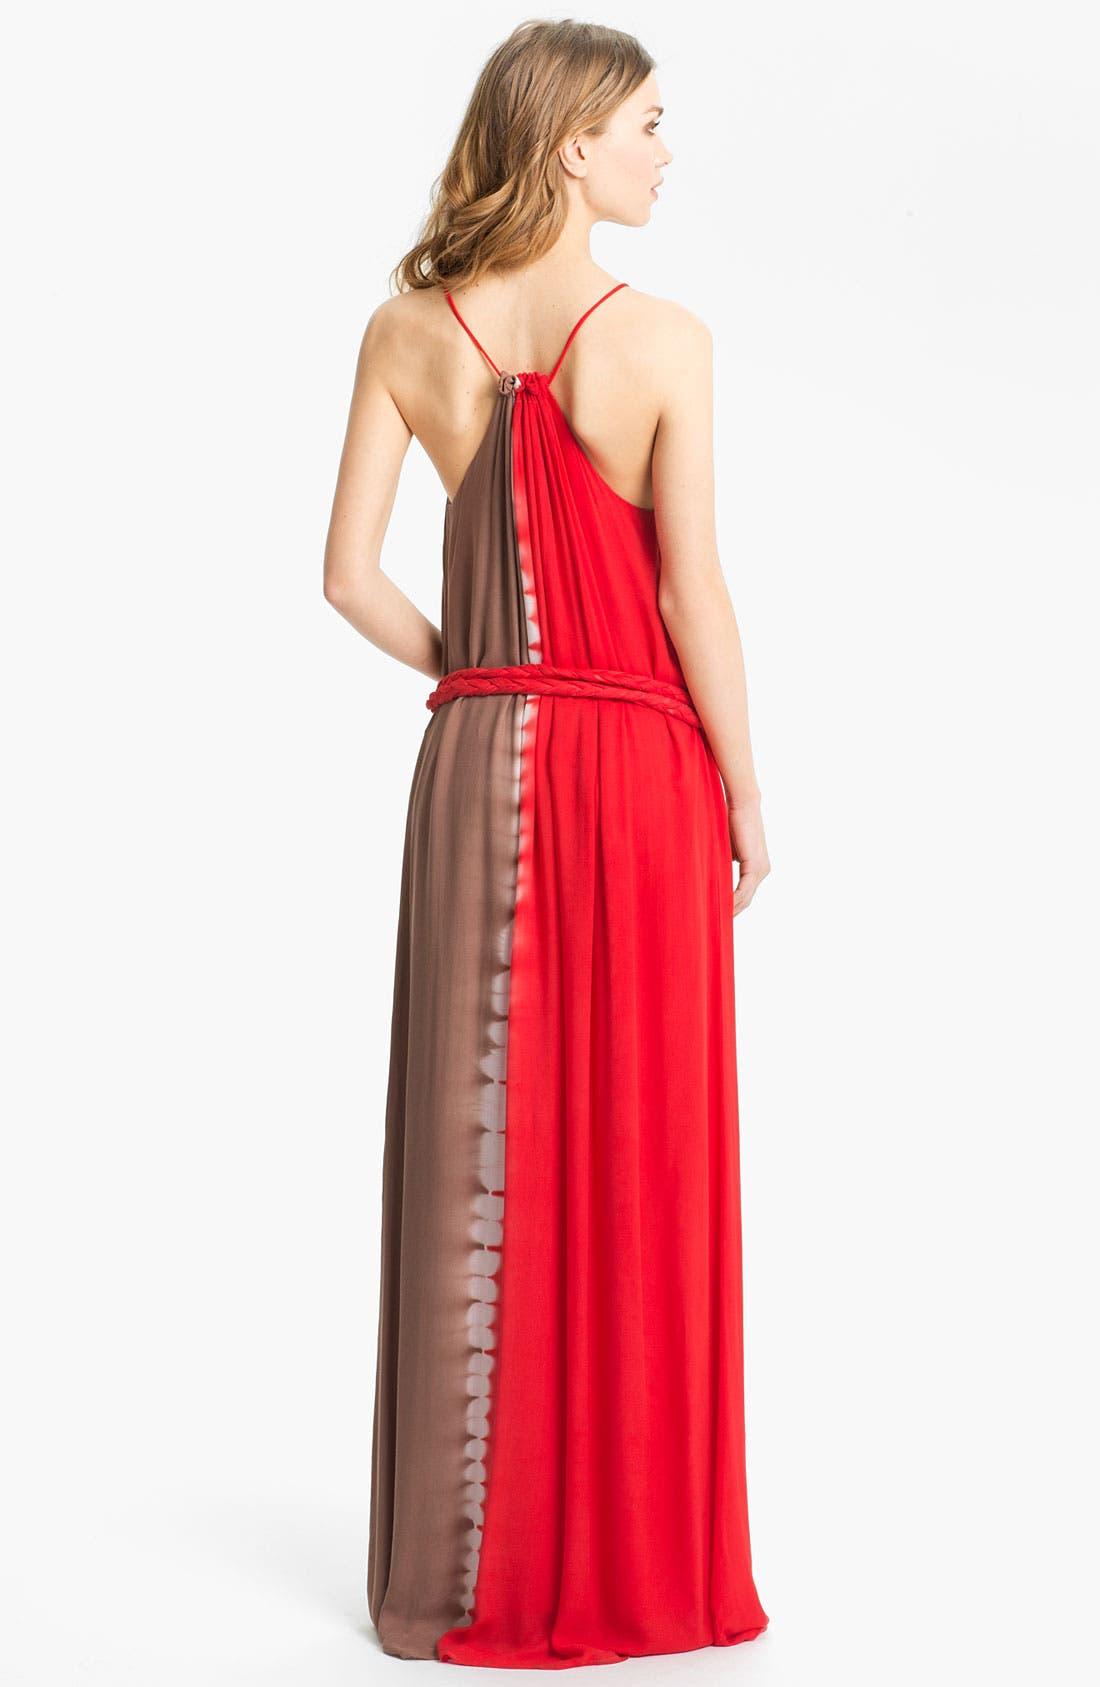 Alternate Image 2  - Young, Fabulous & Broke 'Willow' Tie Dye Maxi Dress